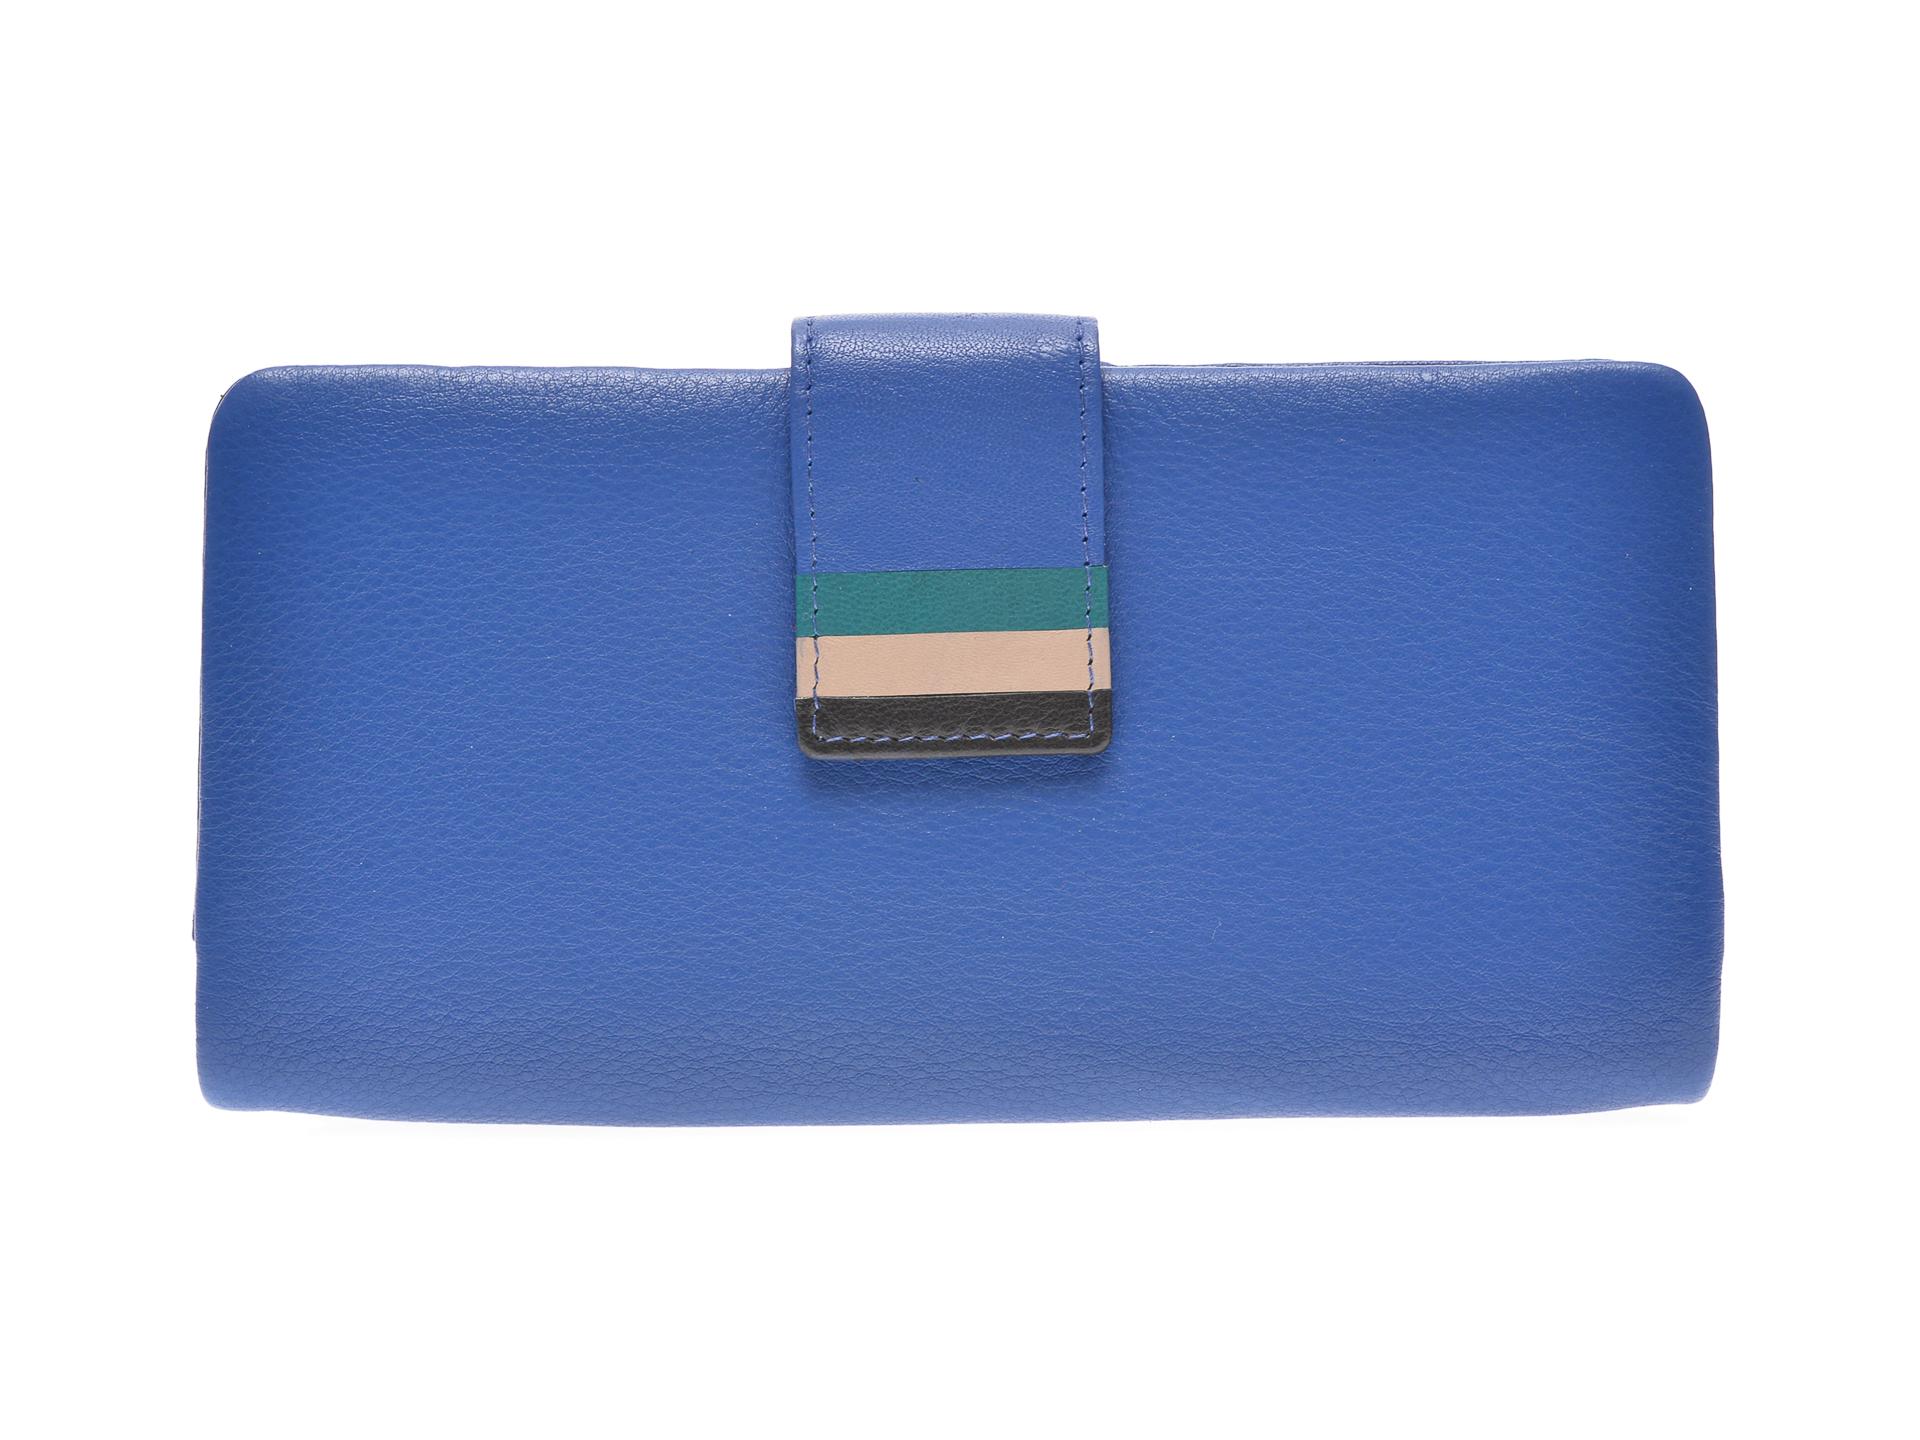 Portofel EPICA bleumarin, 7081, din piele naturala imagine